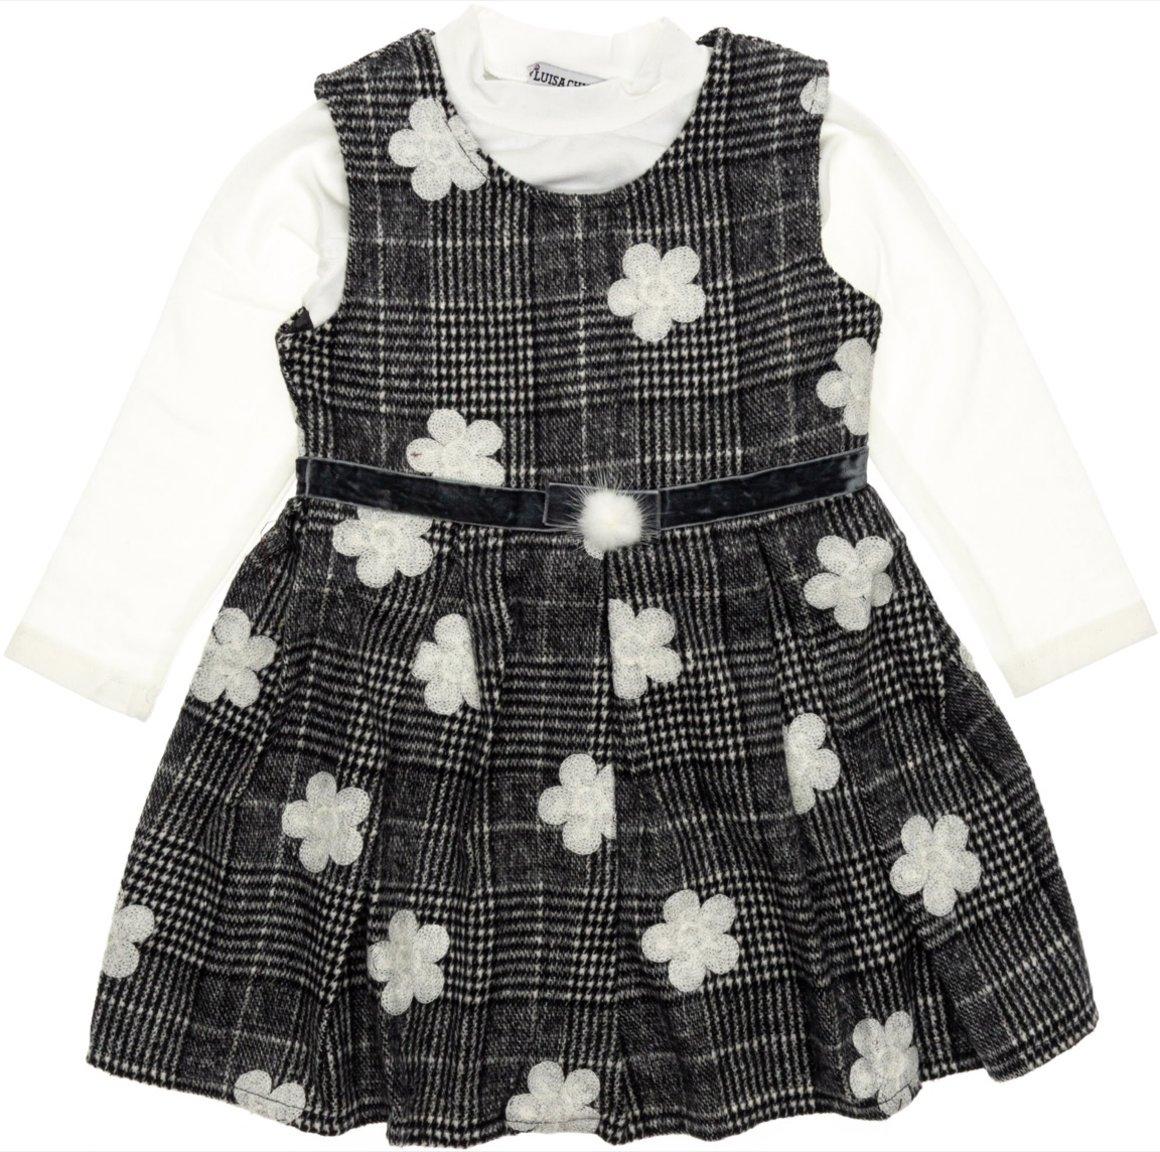 Luisa Chic παιδικό σετ φόρεμα-μπλούζα «Wool and Daisies»